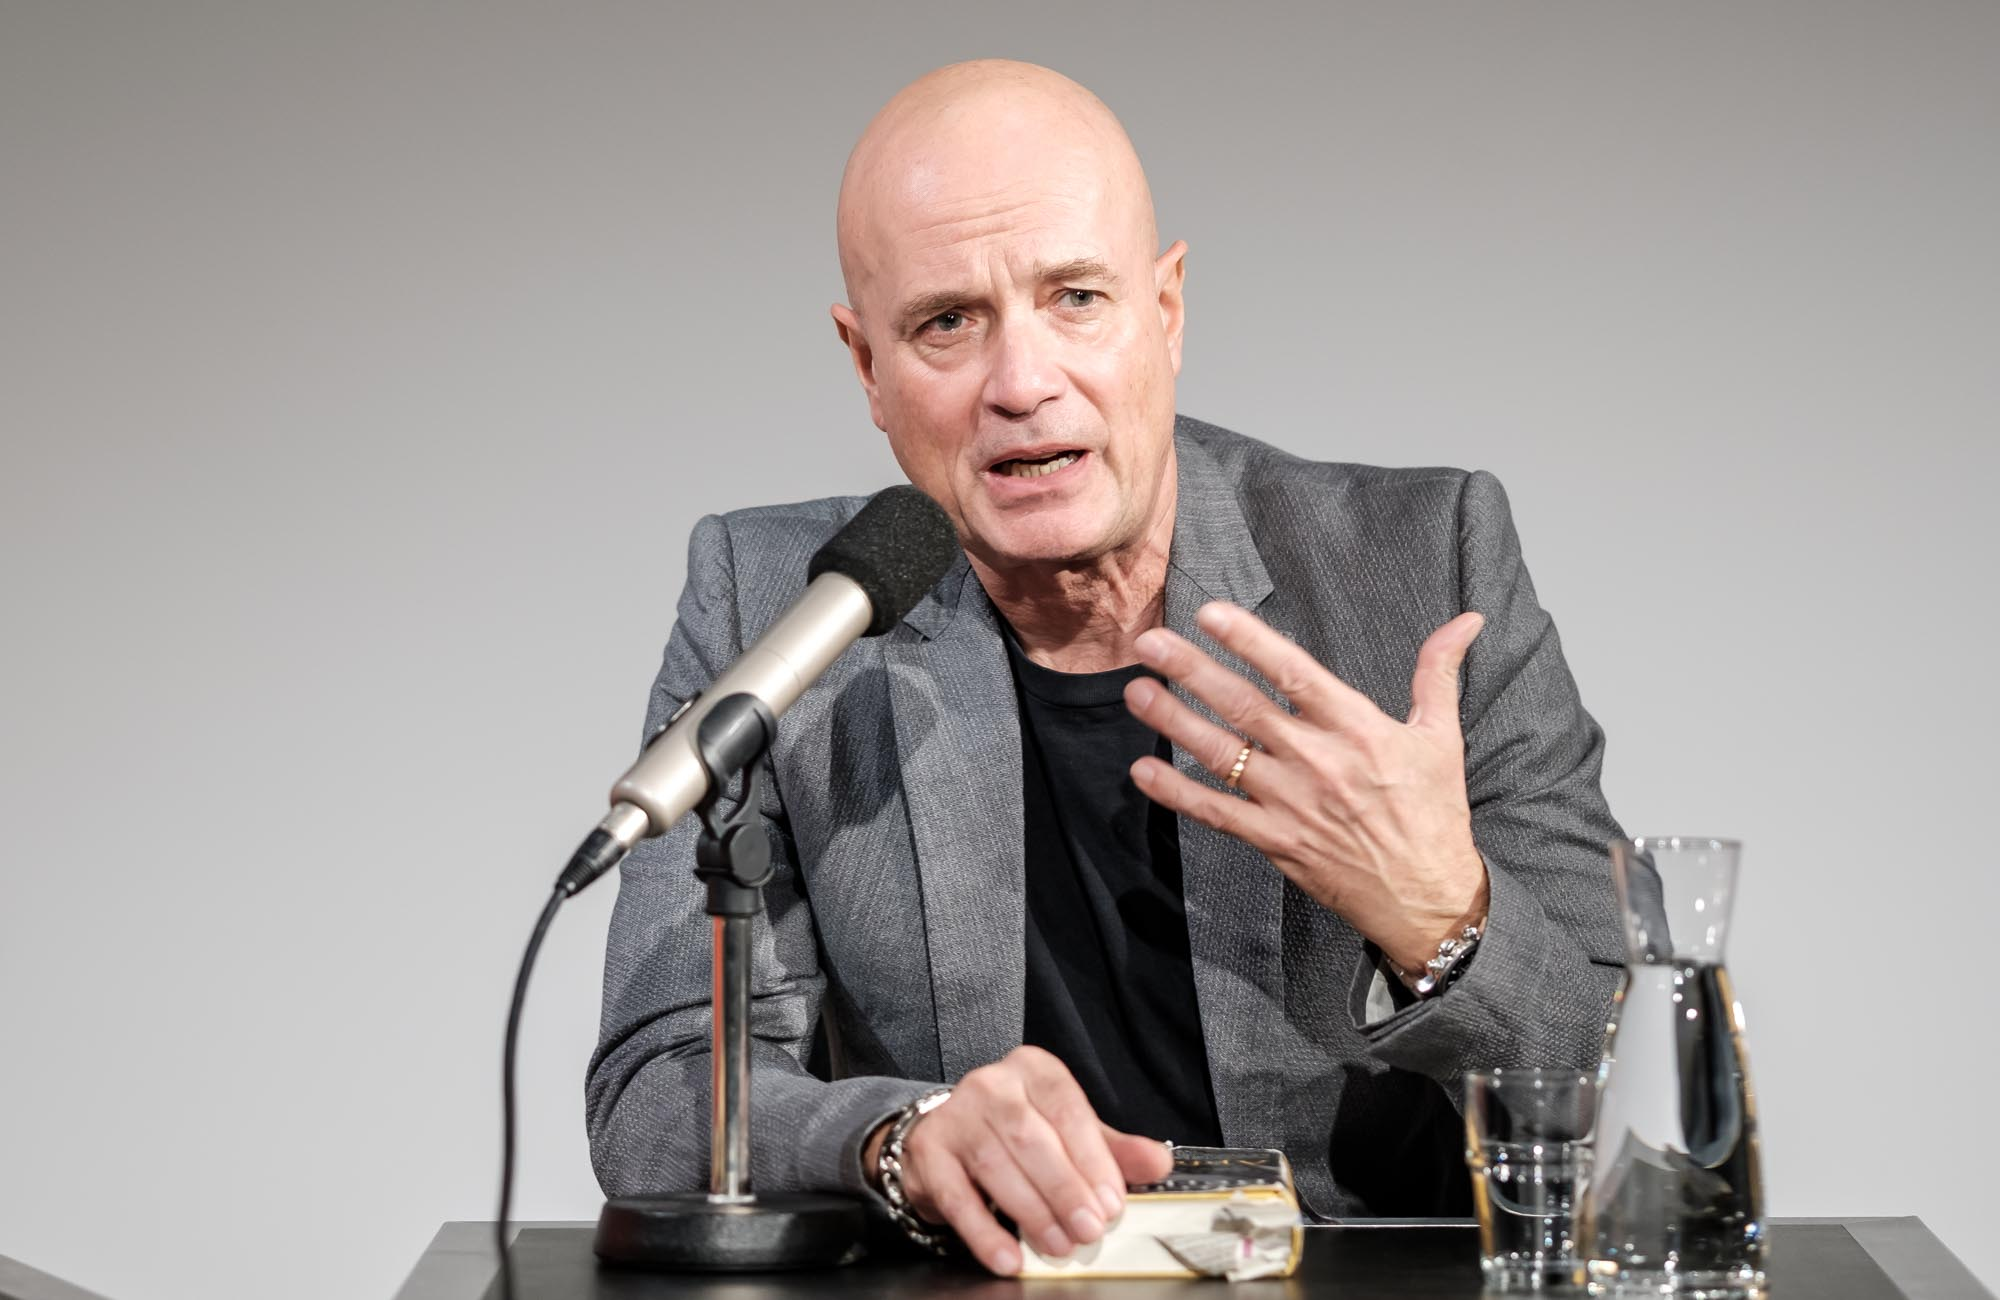 Christian Berkel, Anat Feinberg: Der Apfelbaum, Sonntag, 10.11.19               /                   17.00              Uhr <br/>(c) Sebastian Wenzel